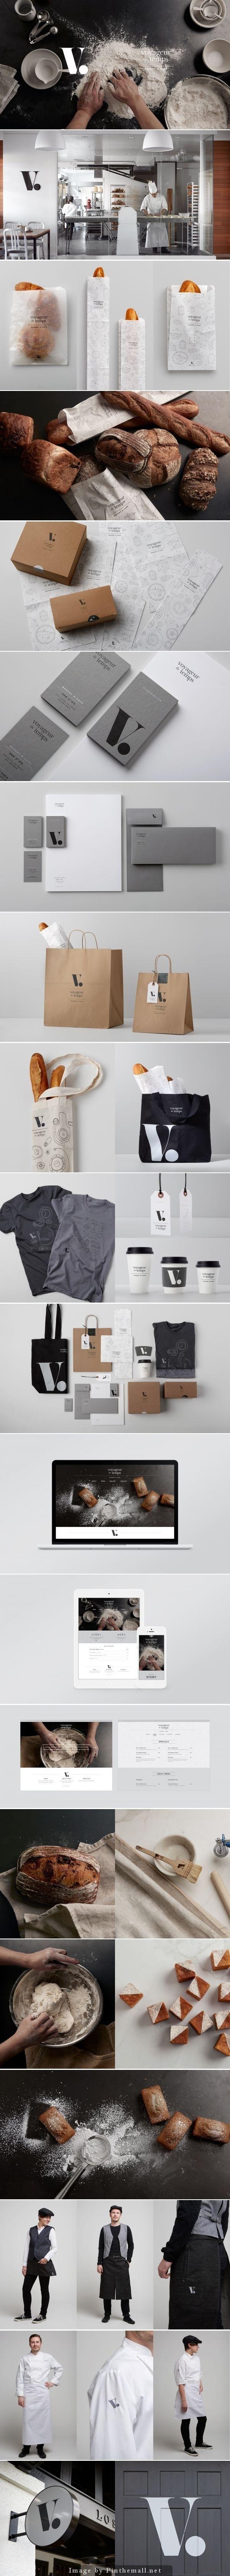 Voyageur du Temps #brand #identity